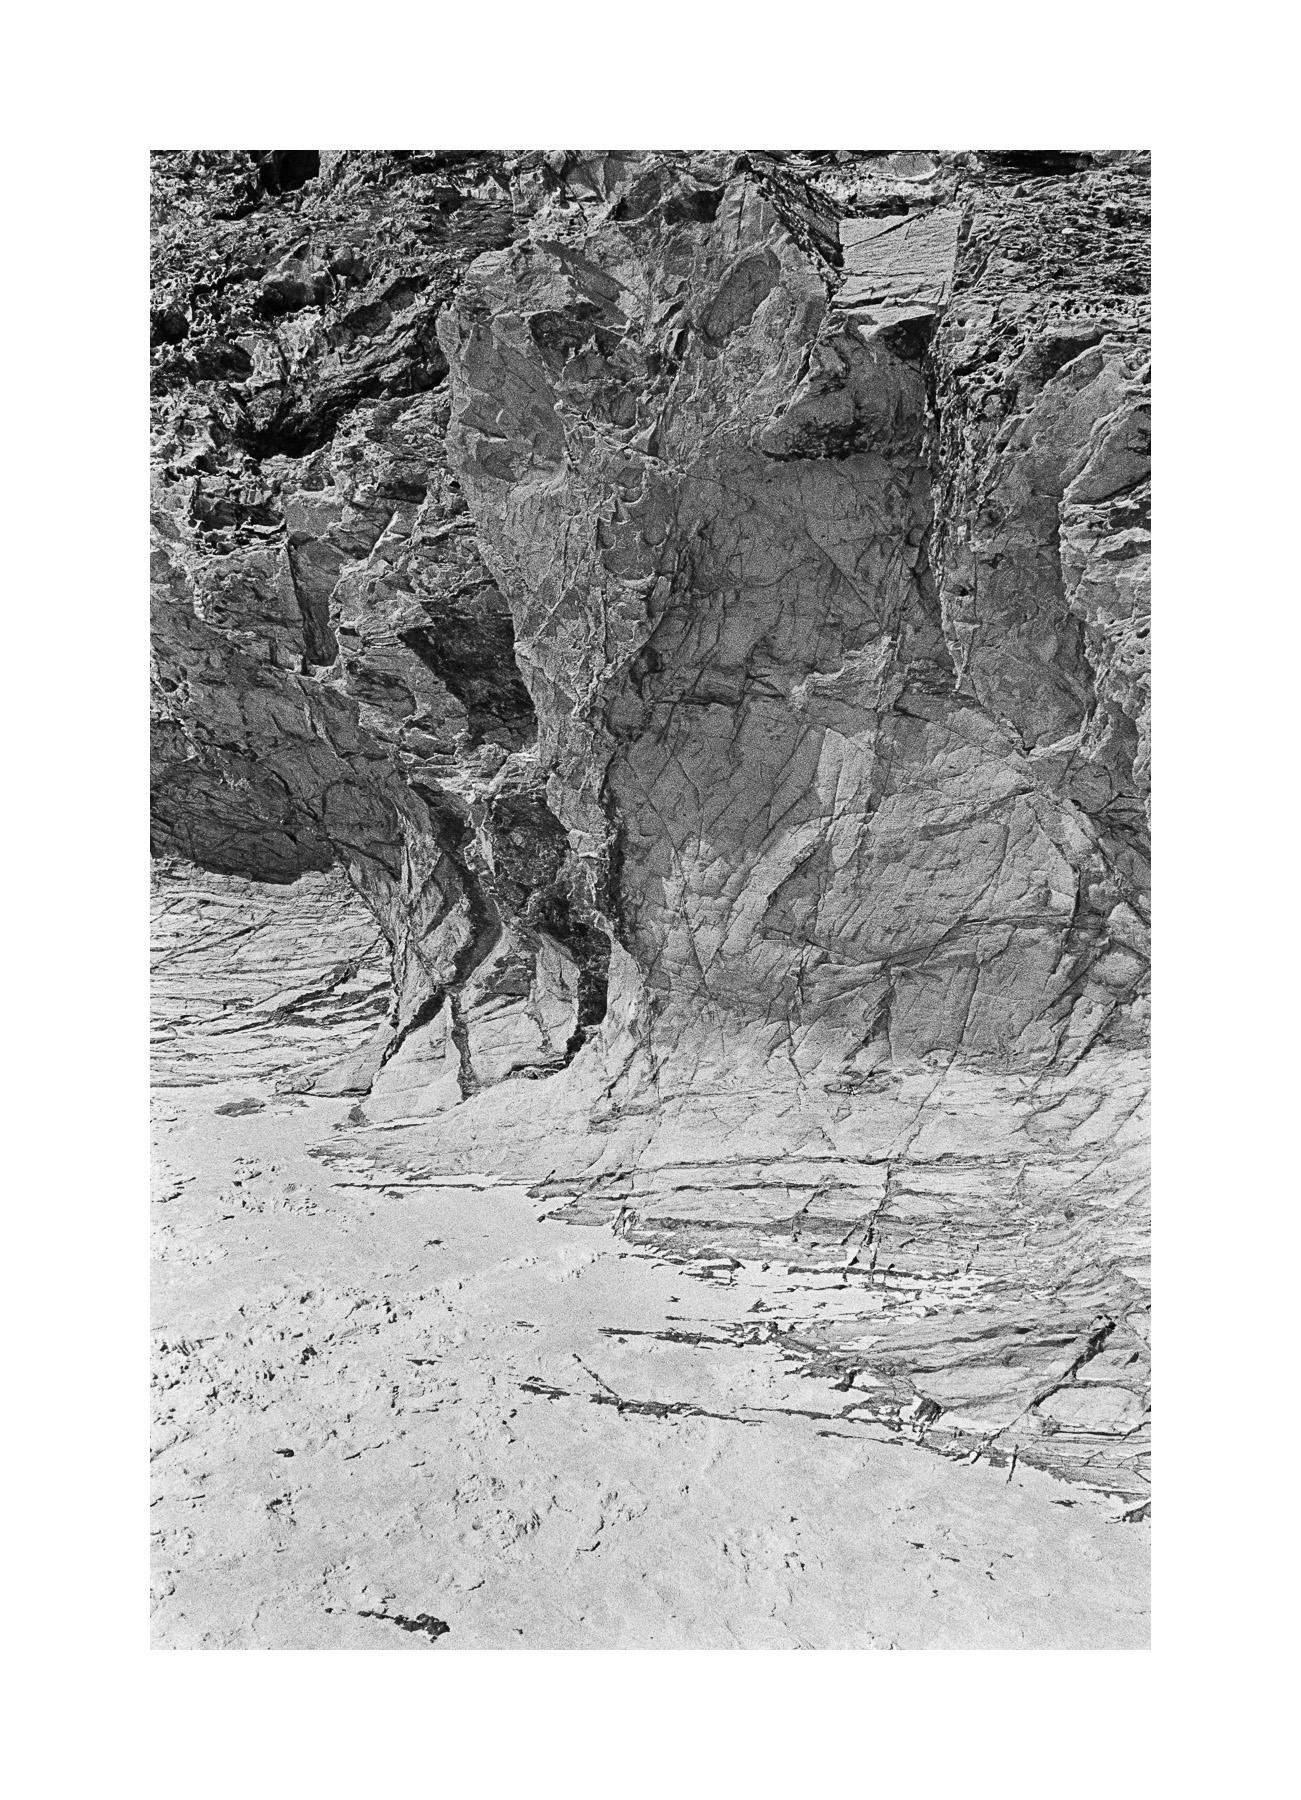 20181103 - Roll 263 - 025-Nick-Bedford,-Photographer-Black and White, Currumbin Rocks, Kodak TRI-X 400, Leica M7, Seascape, Voigtlander 35mm F1.7.jpg